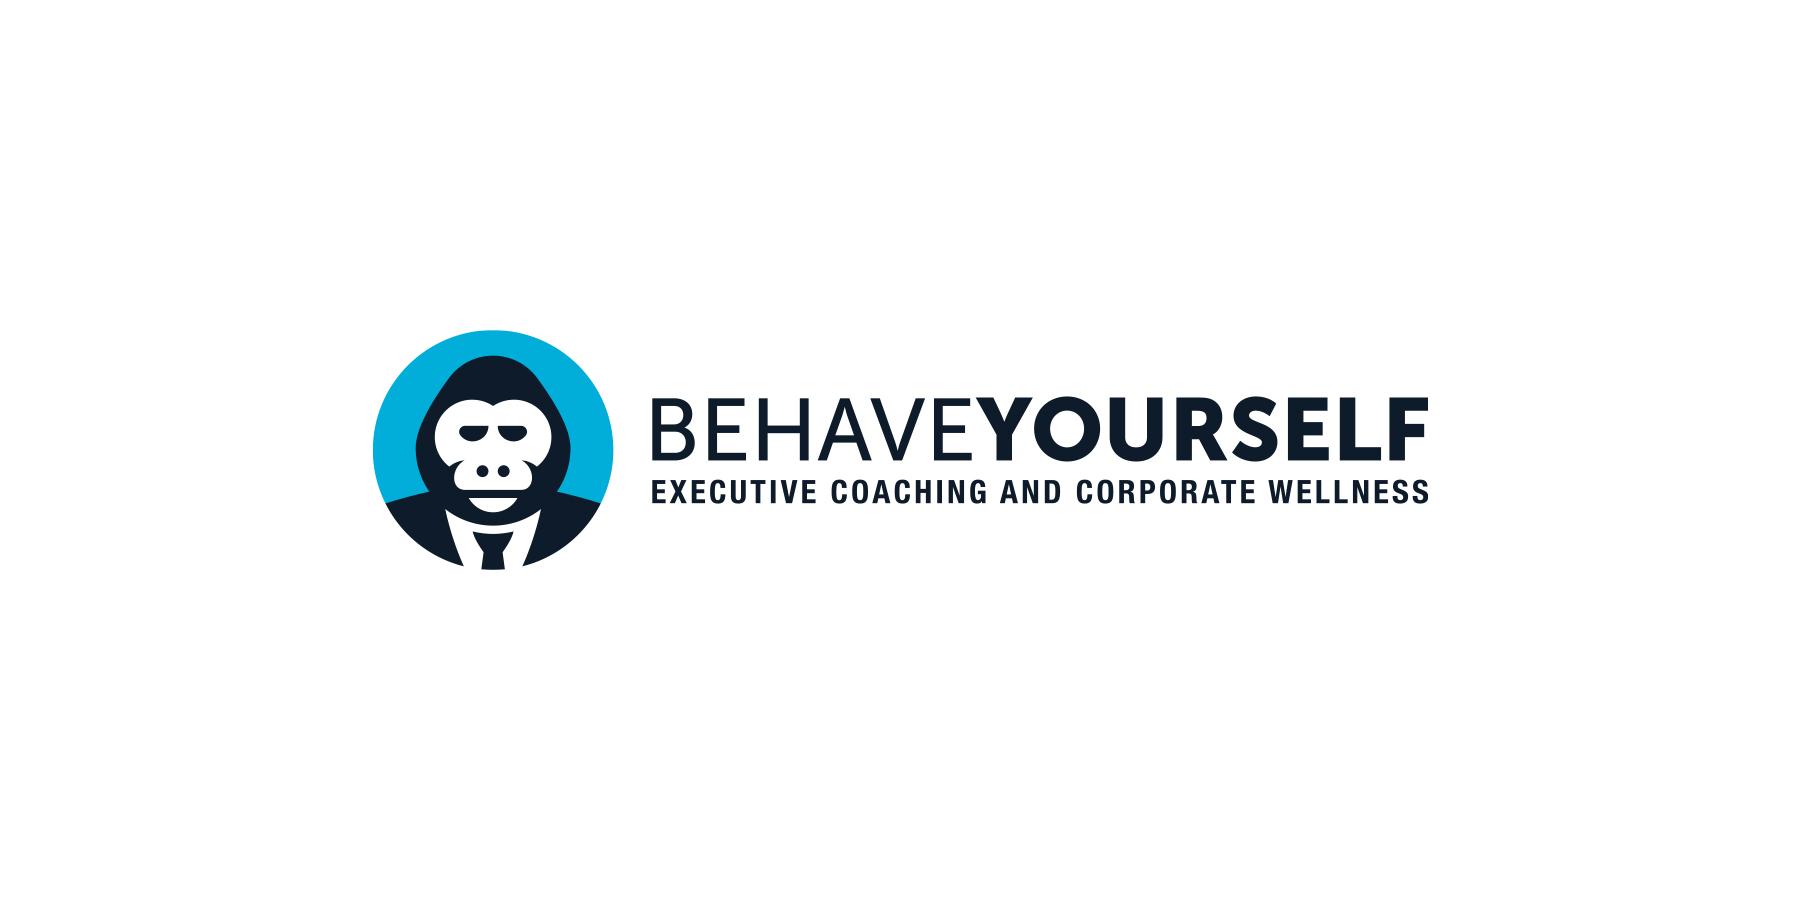 behave-yourself-logo-design-01